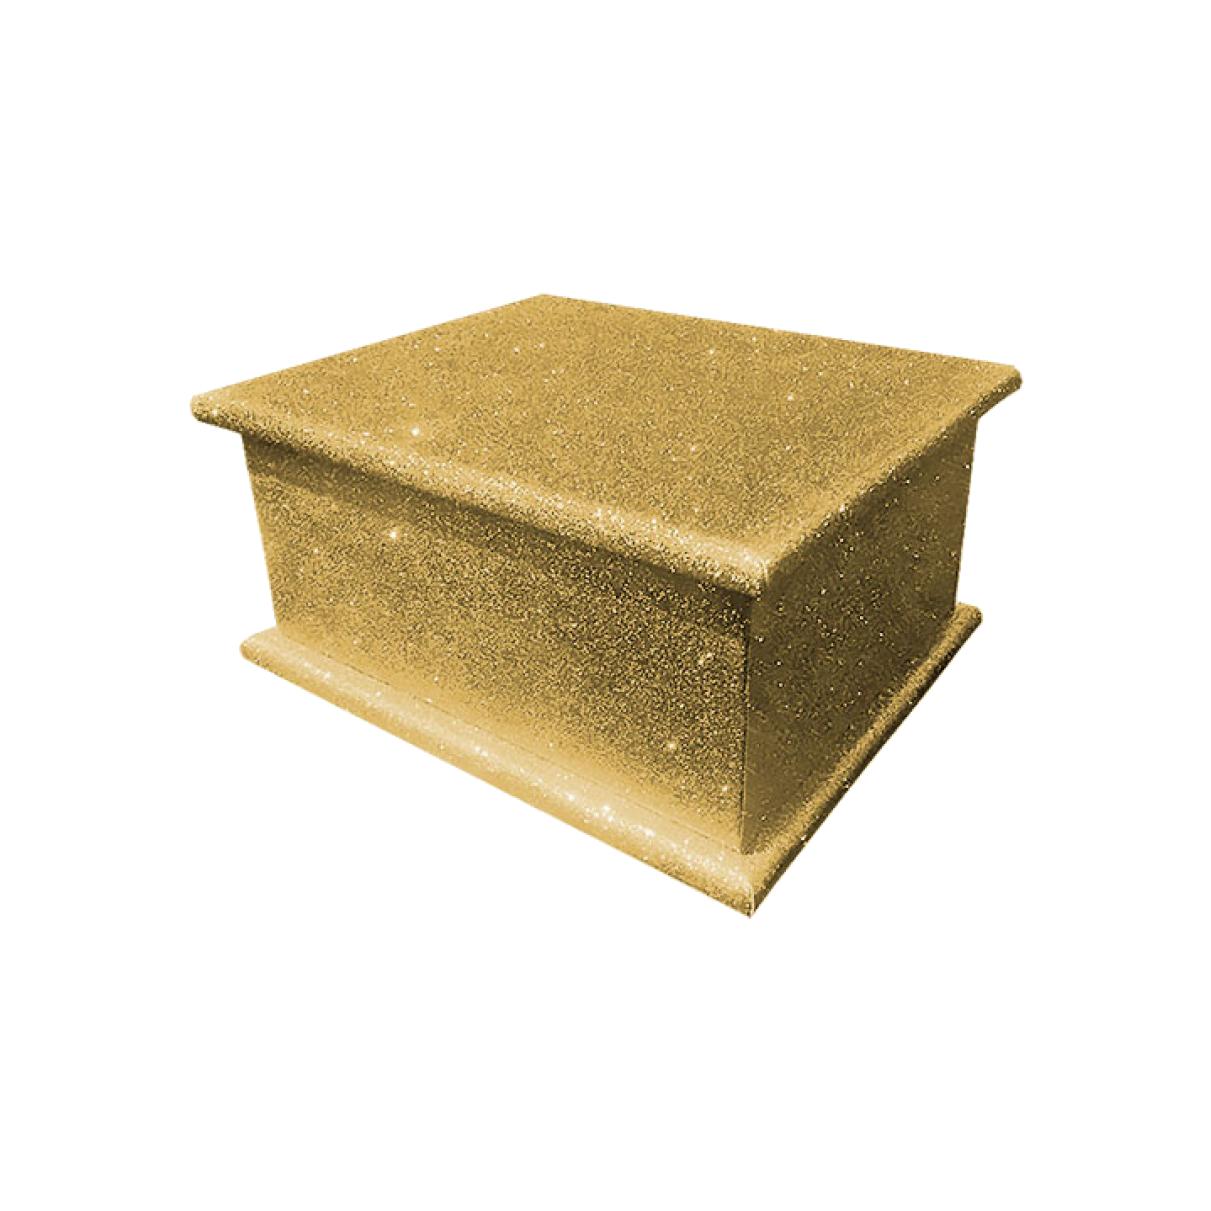 Glitter Adult Ashes Casket – Gold